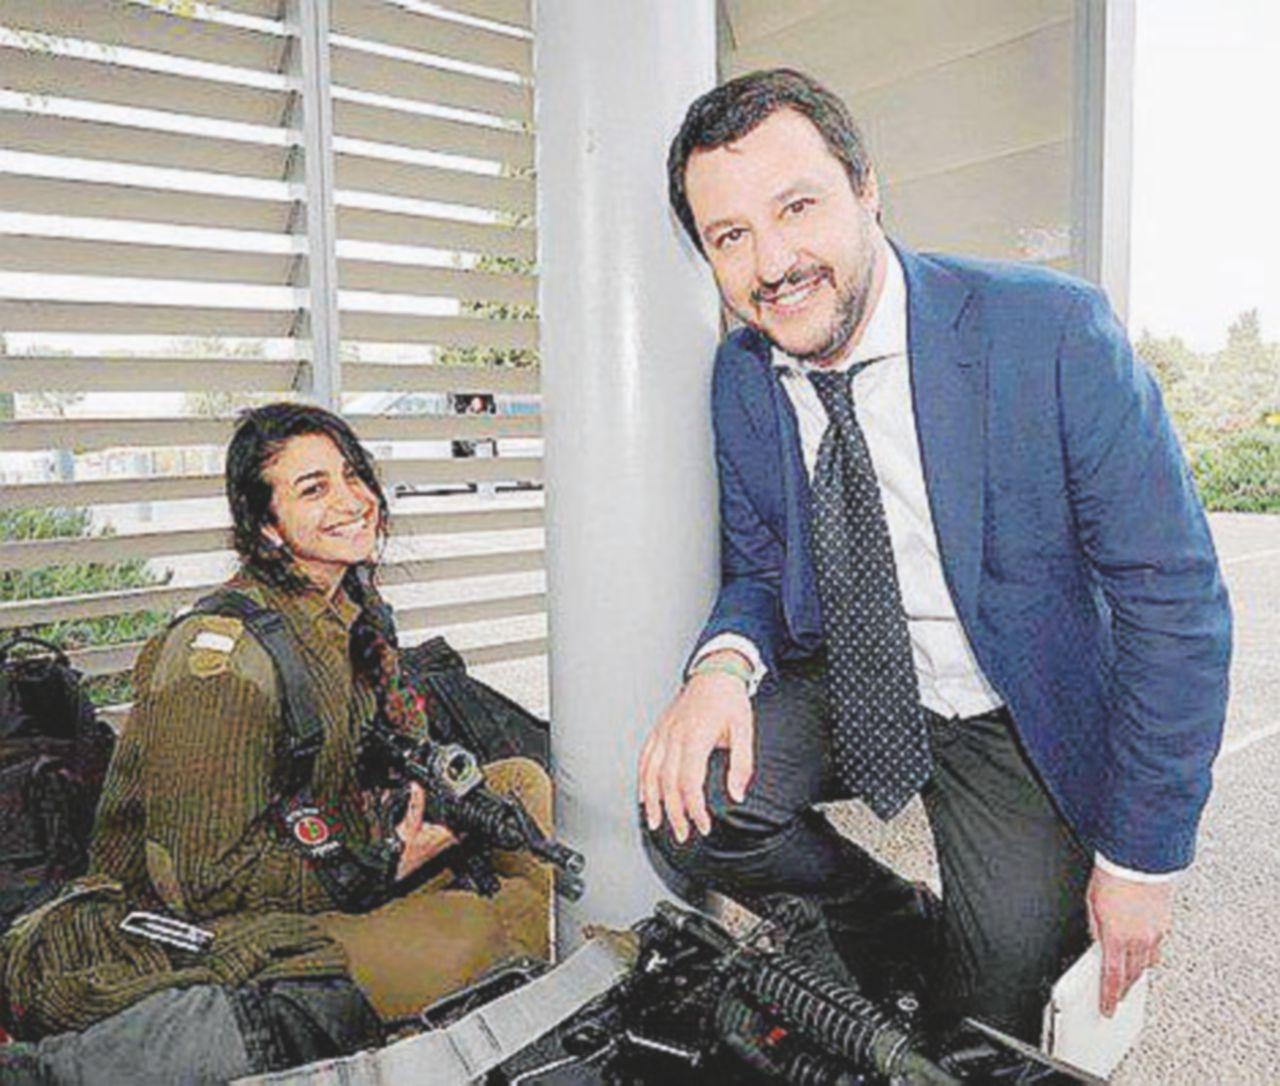 Salvini tra gli ultrà israeliani e Putin